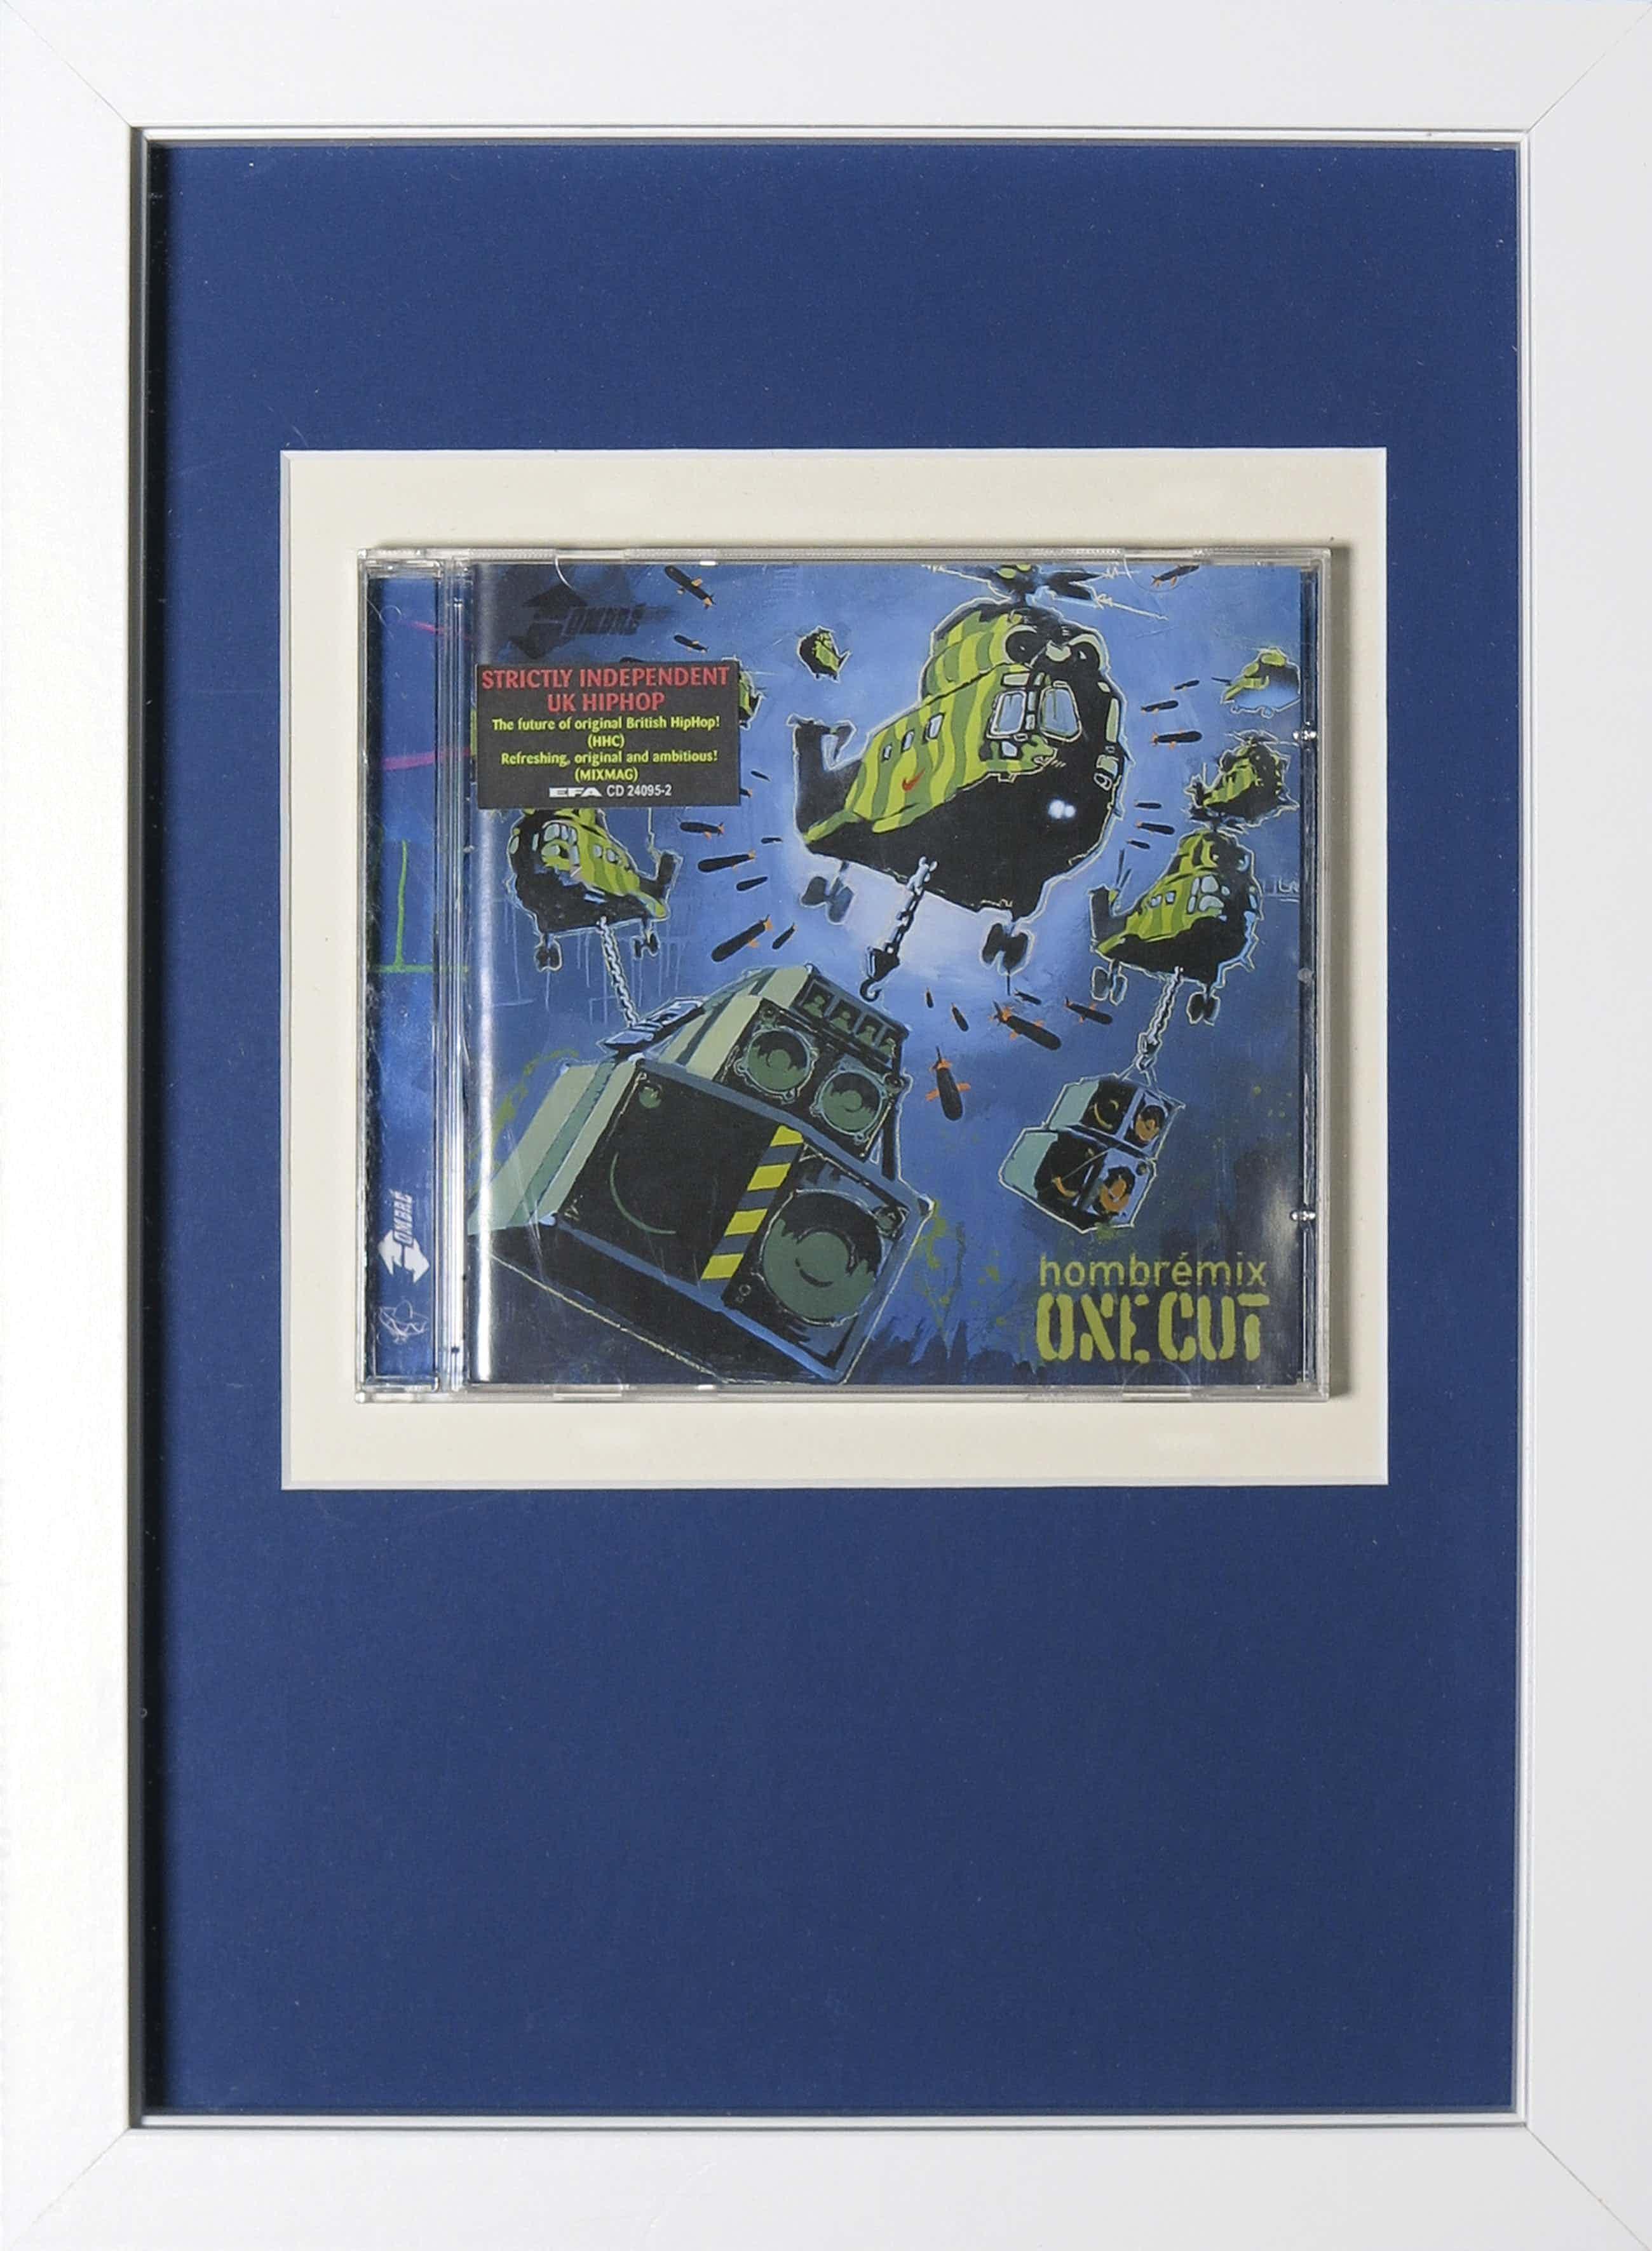 Banksy - One Cut, Hombrémix (CD) - Ingelijst kopen? Bied vanaf 126!